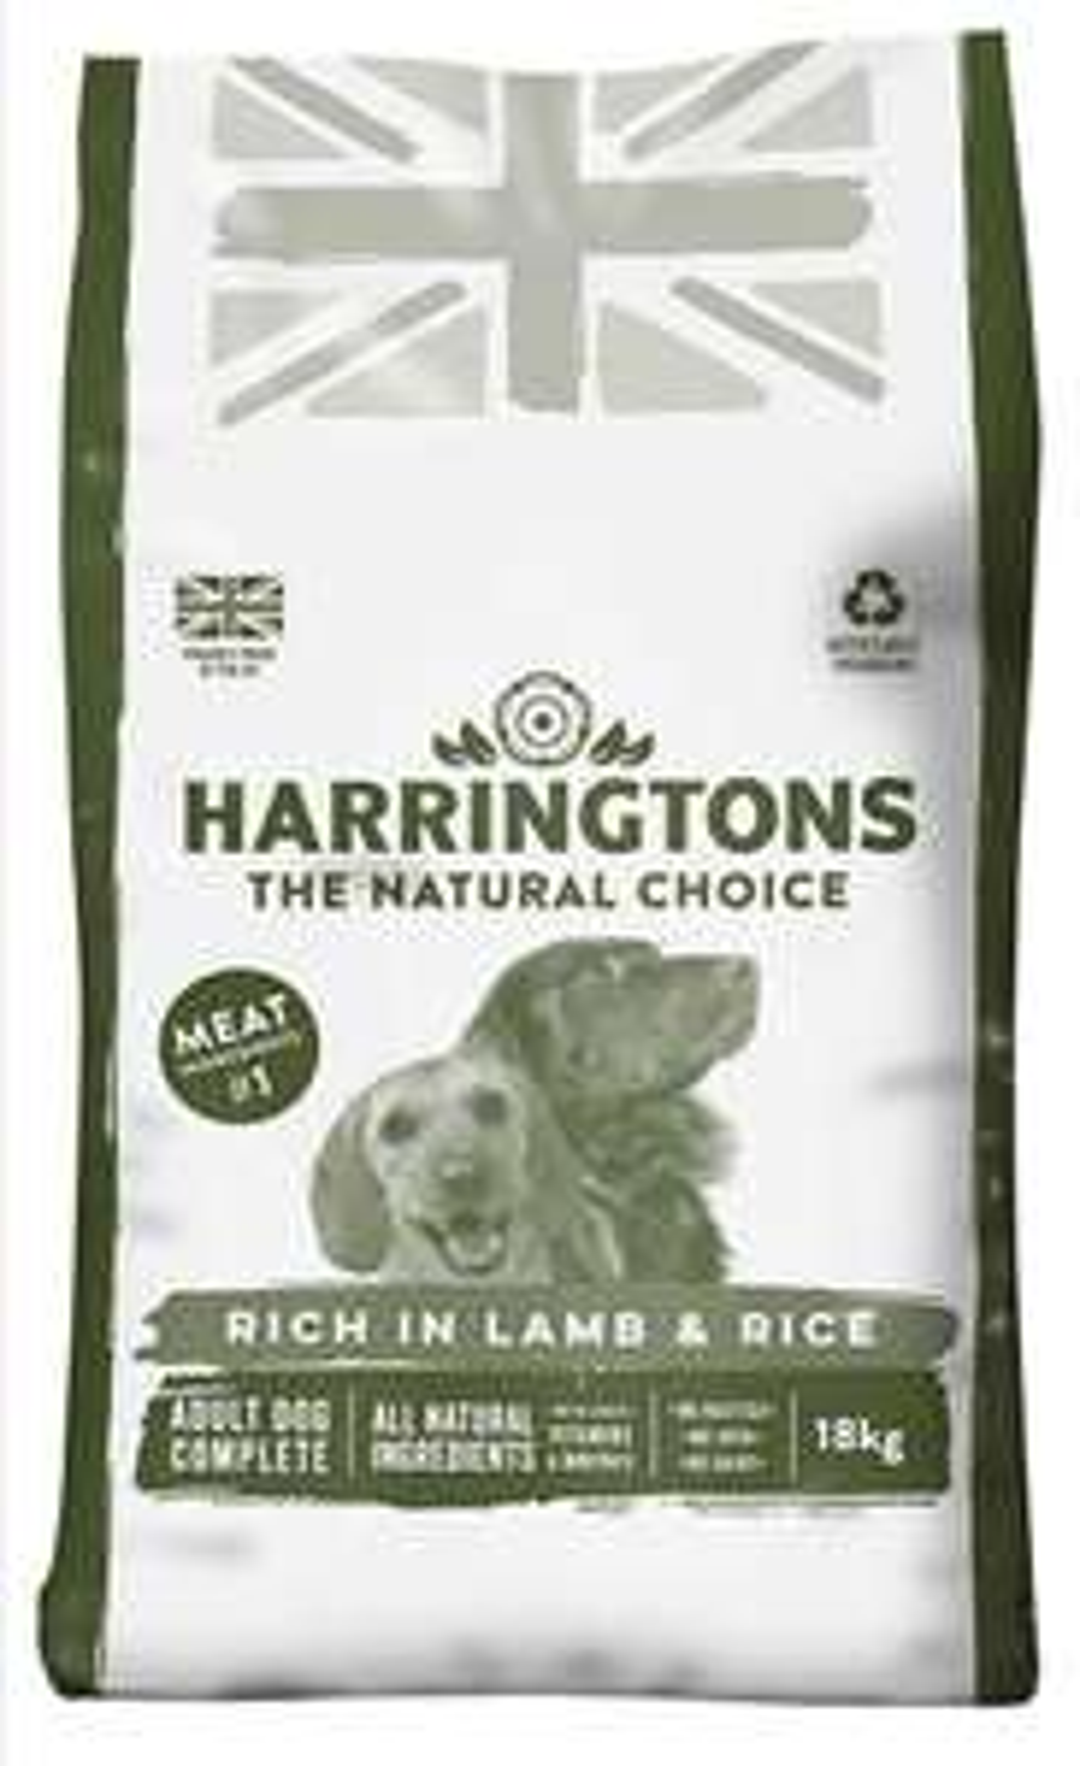 Harrington's Dry Dog Food 18kg £16.87 @ Amazon with S&S